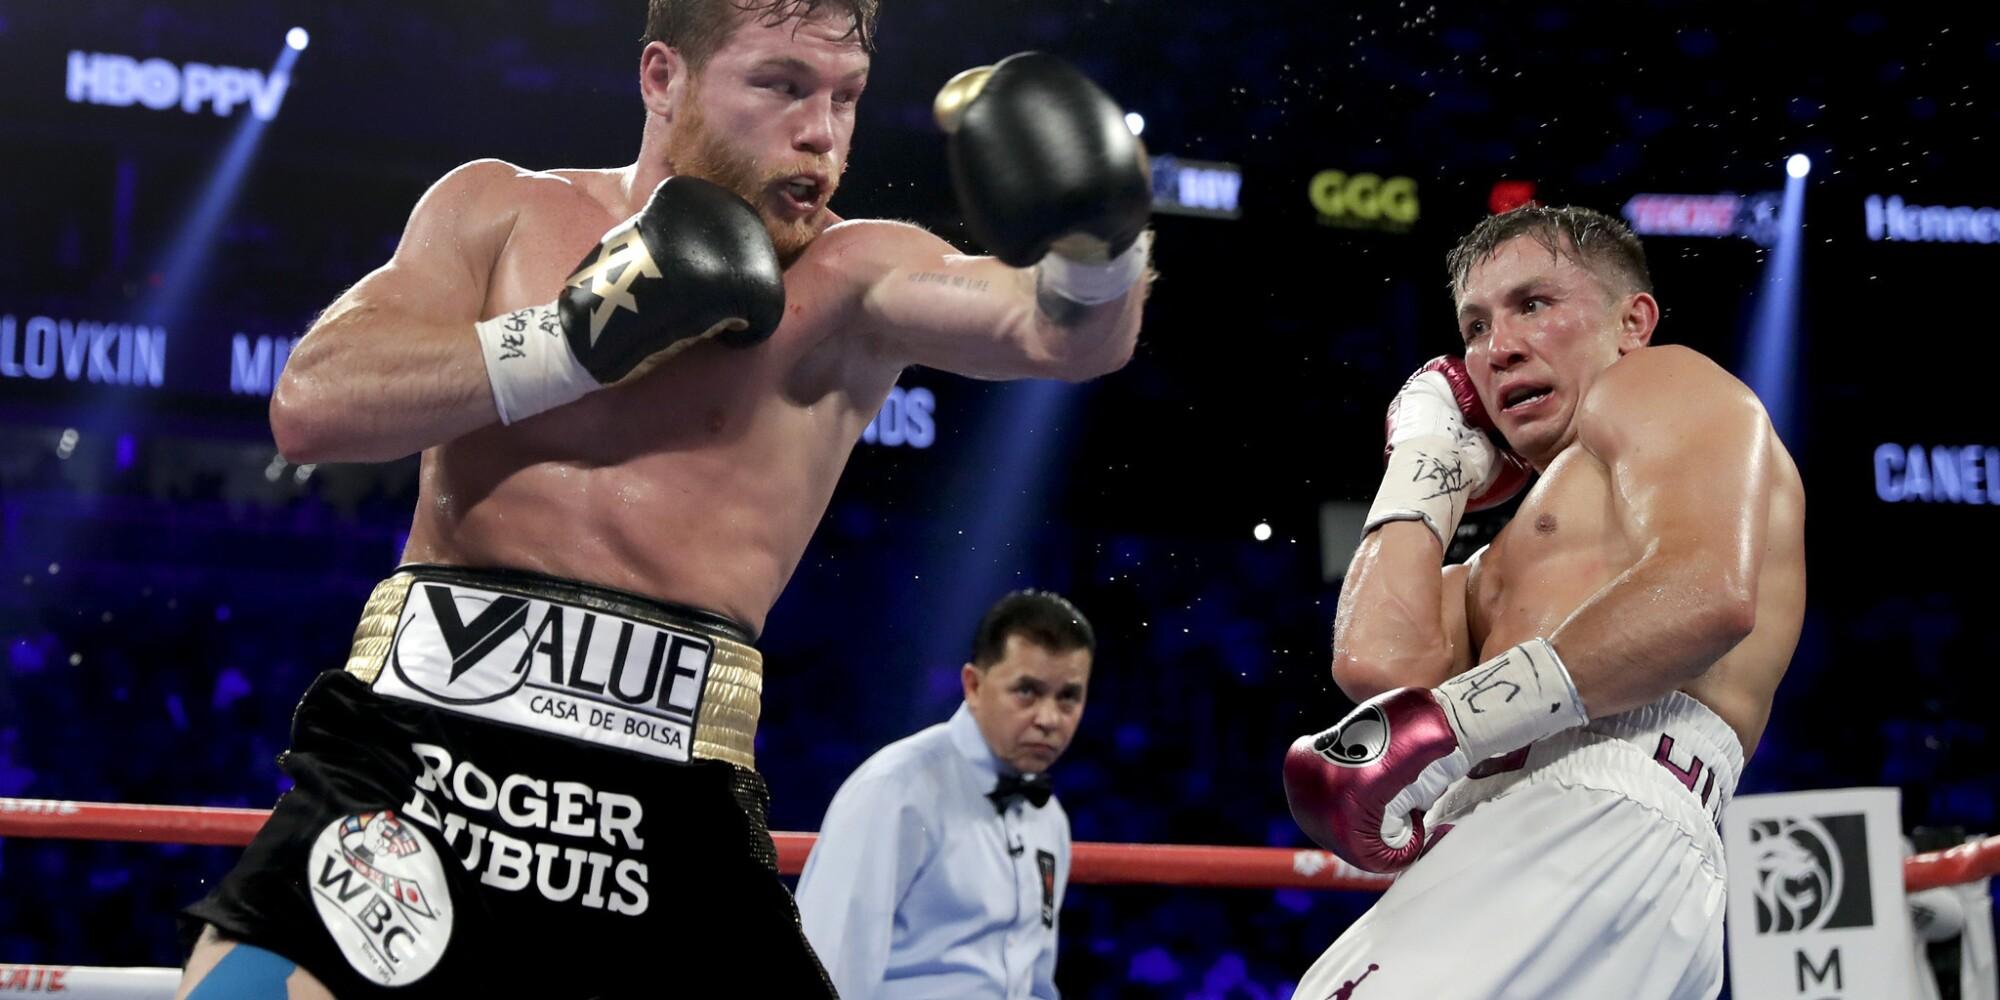 Canelo-GGG Rematch: Alvarez beats Golovkin by majority decision